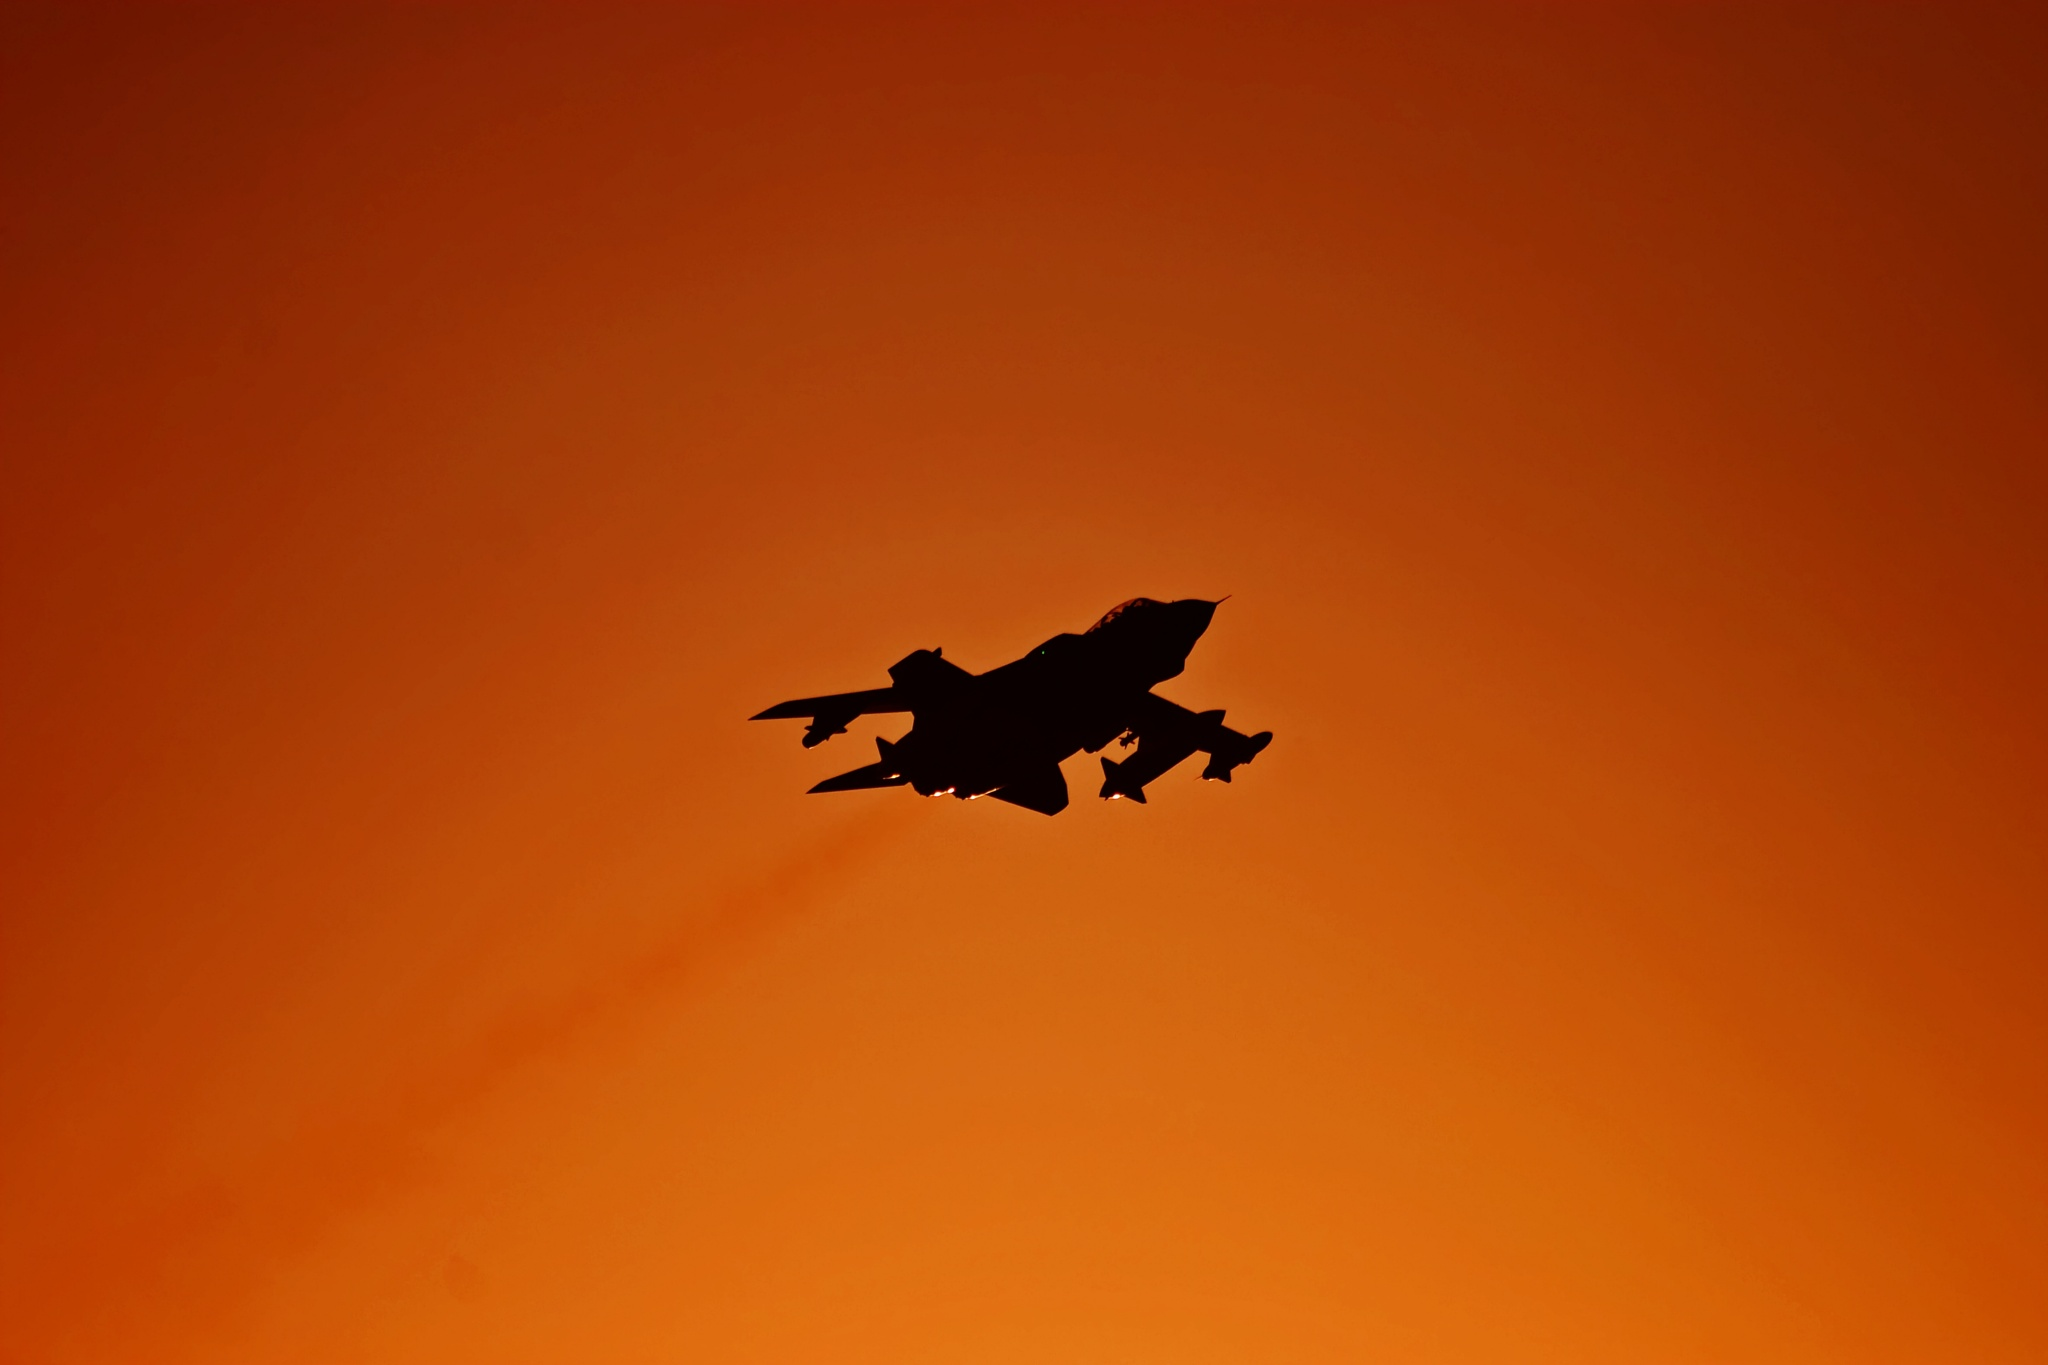 Tornado GR4 by JR's Photography